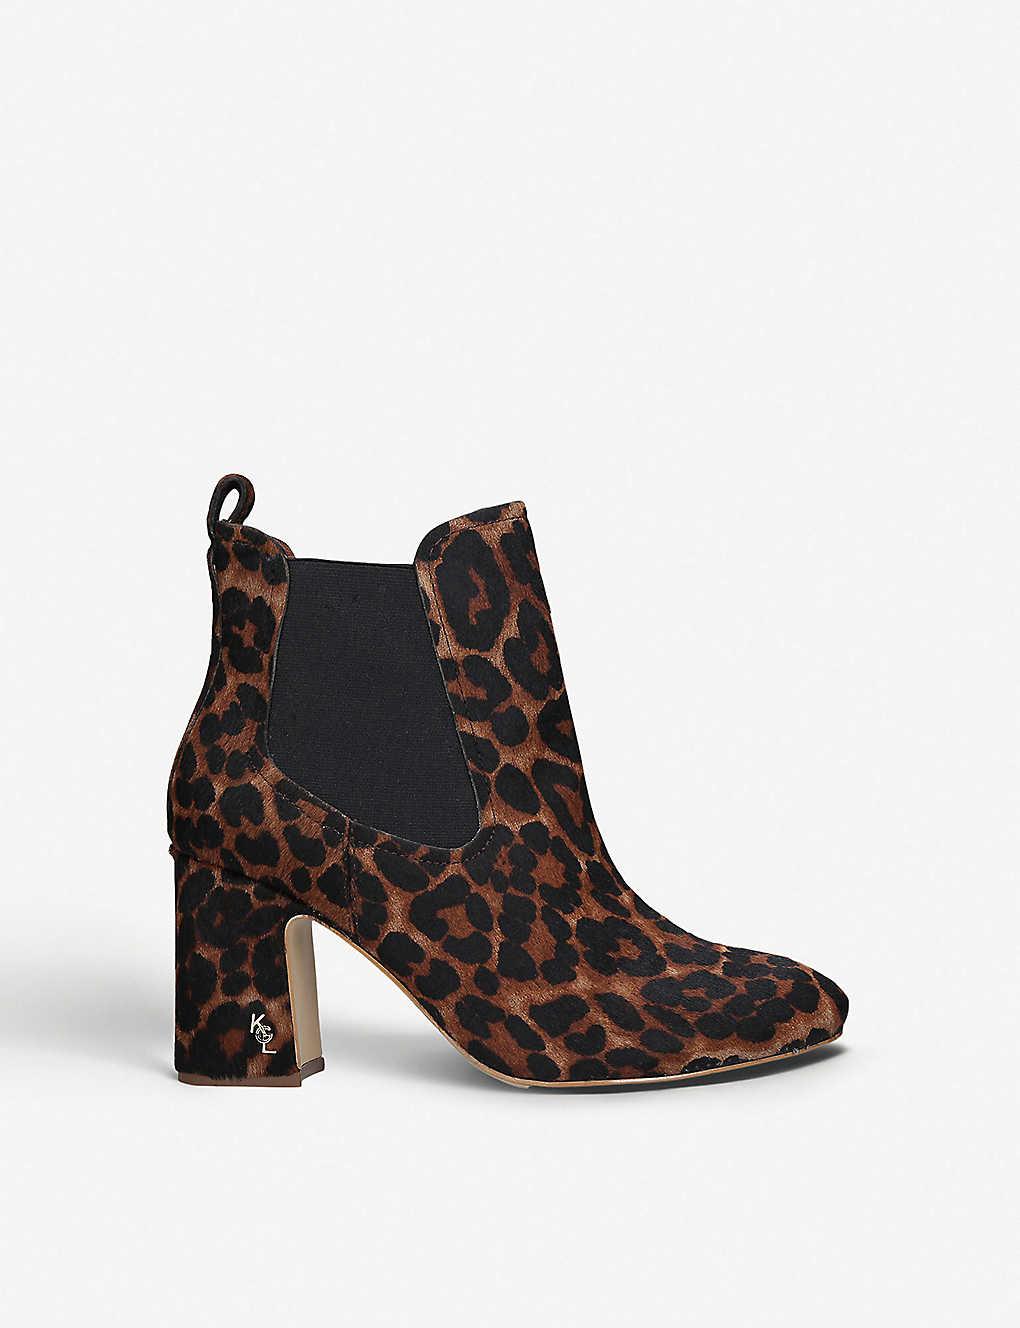 9a4c4af08de1 KURT GEIGER LONDON - Raylan leopard-print pony hair ankle boots ...